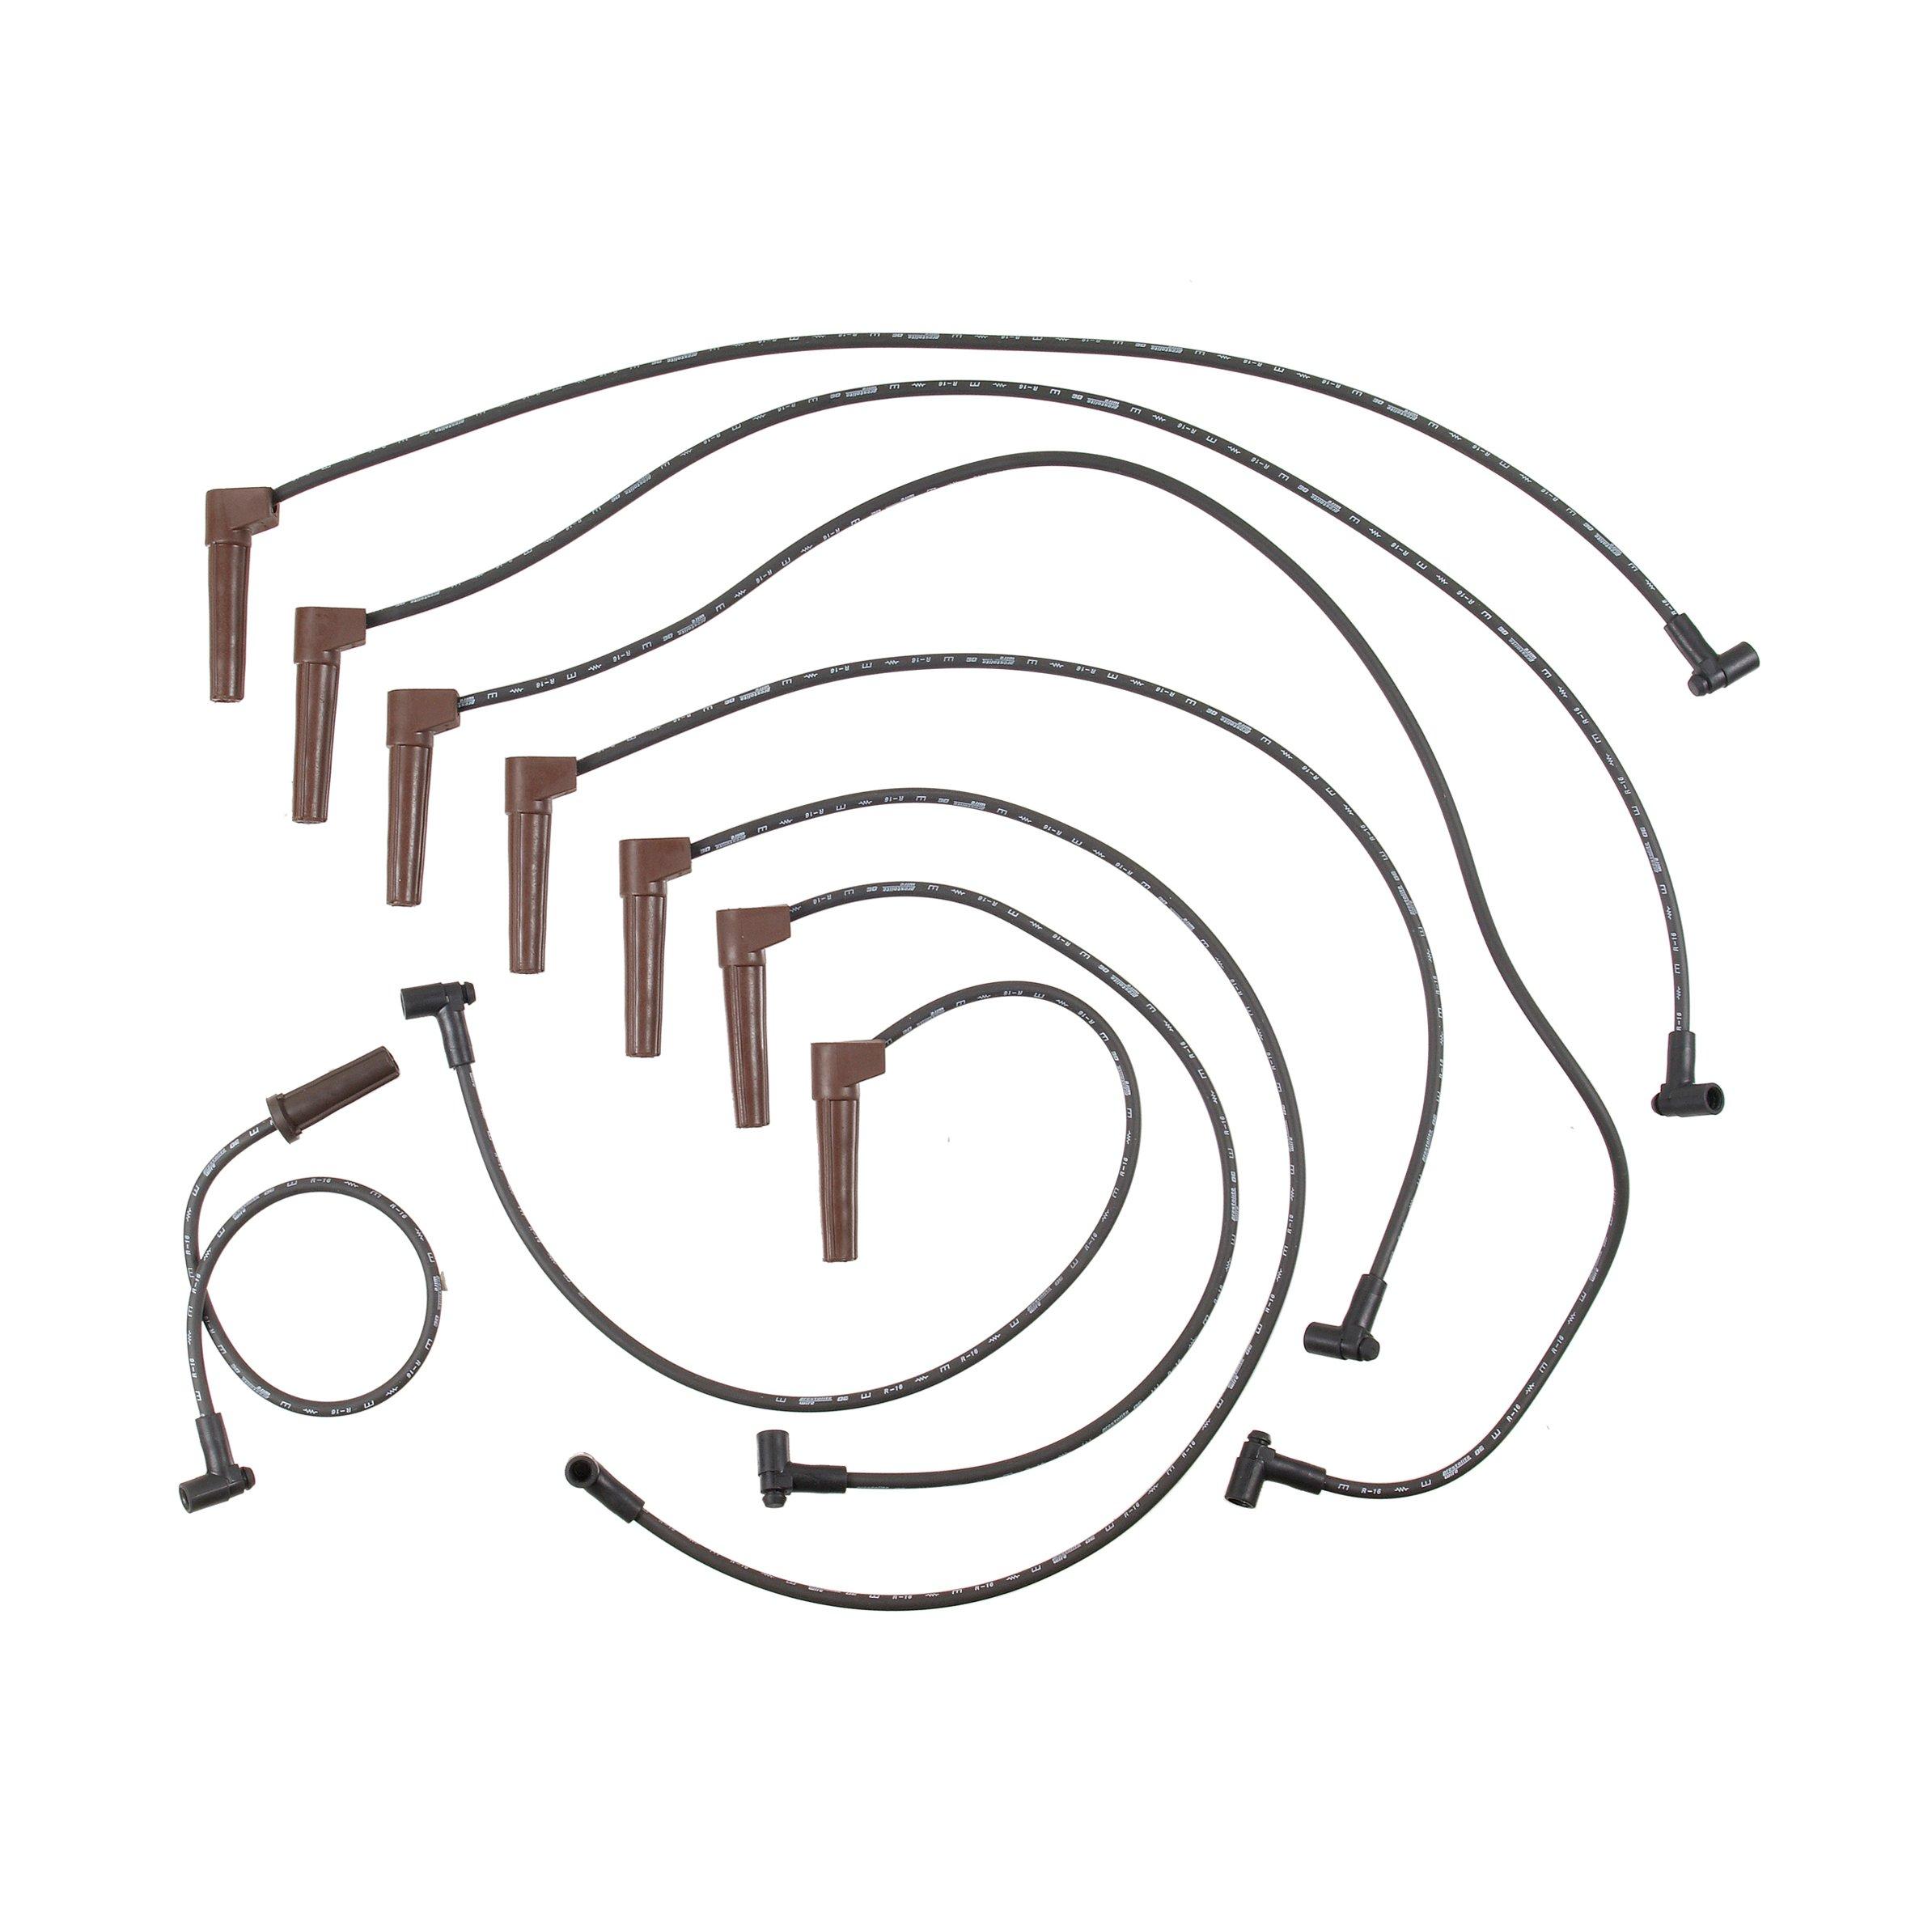 Proconnect Spark Plug Wire Set